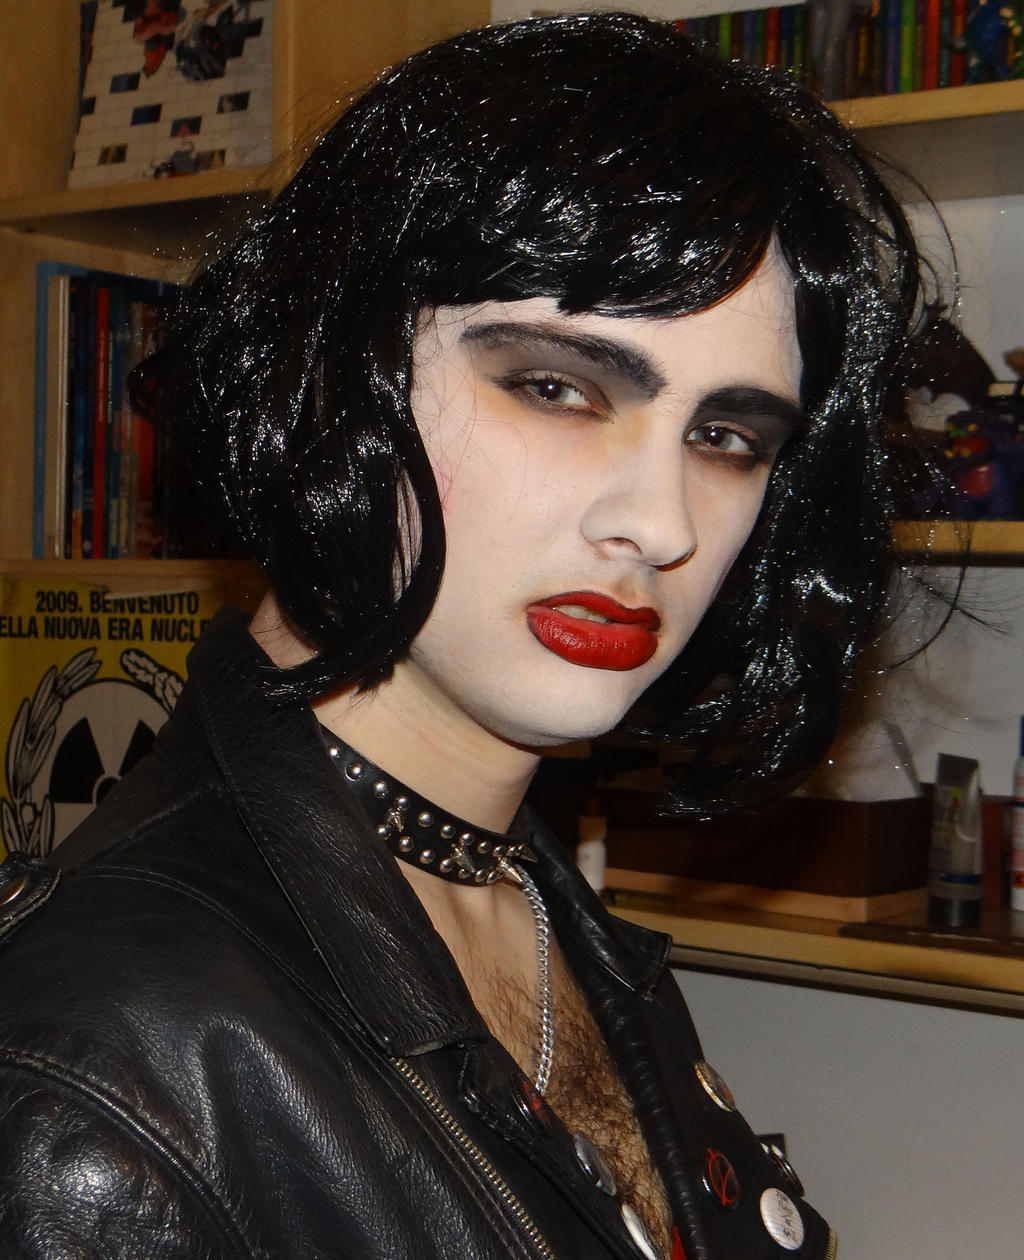 Transvestite pics picture 64